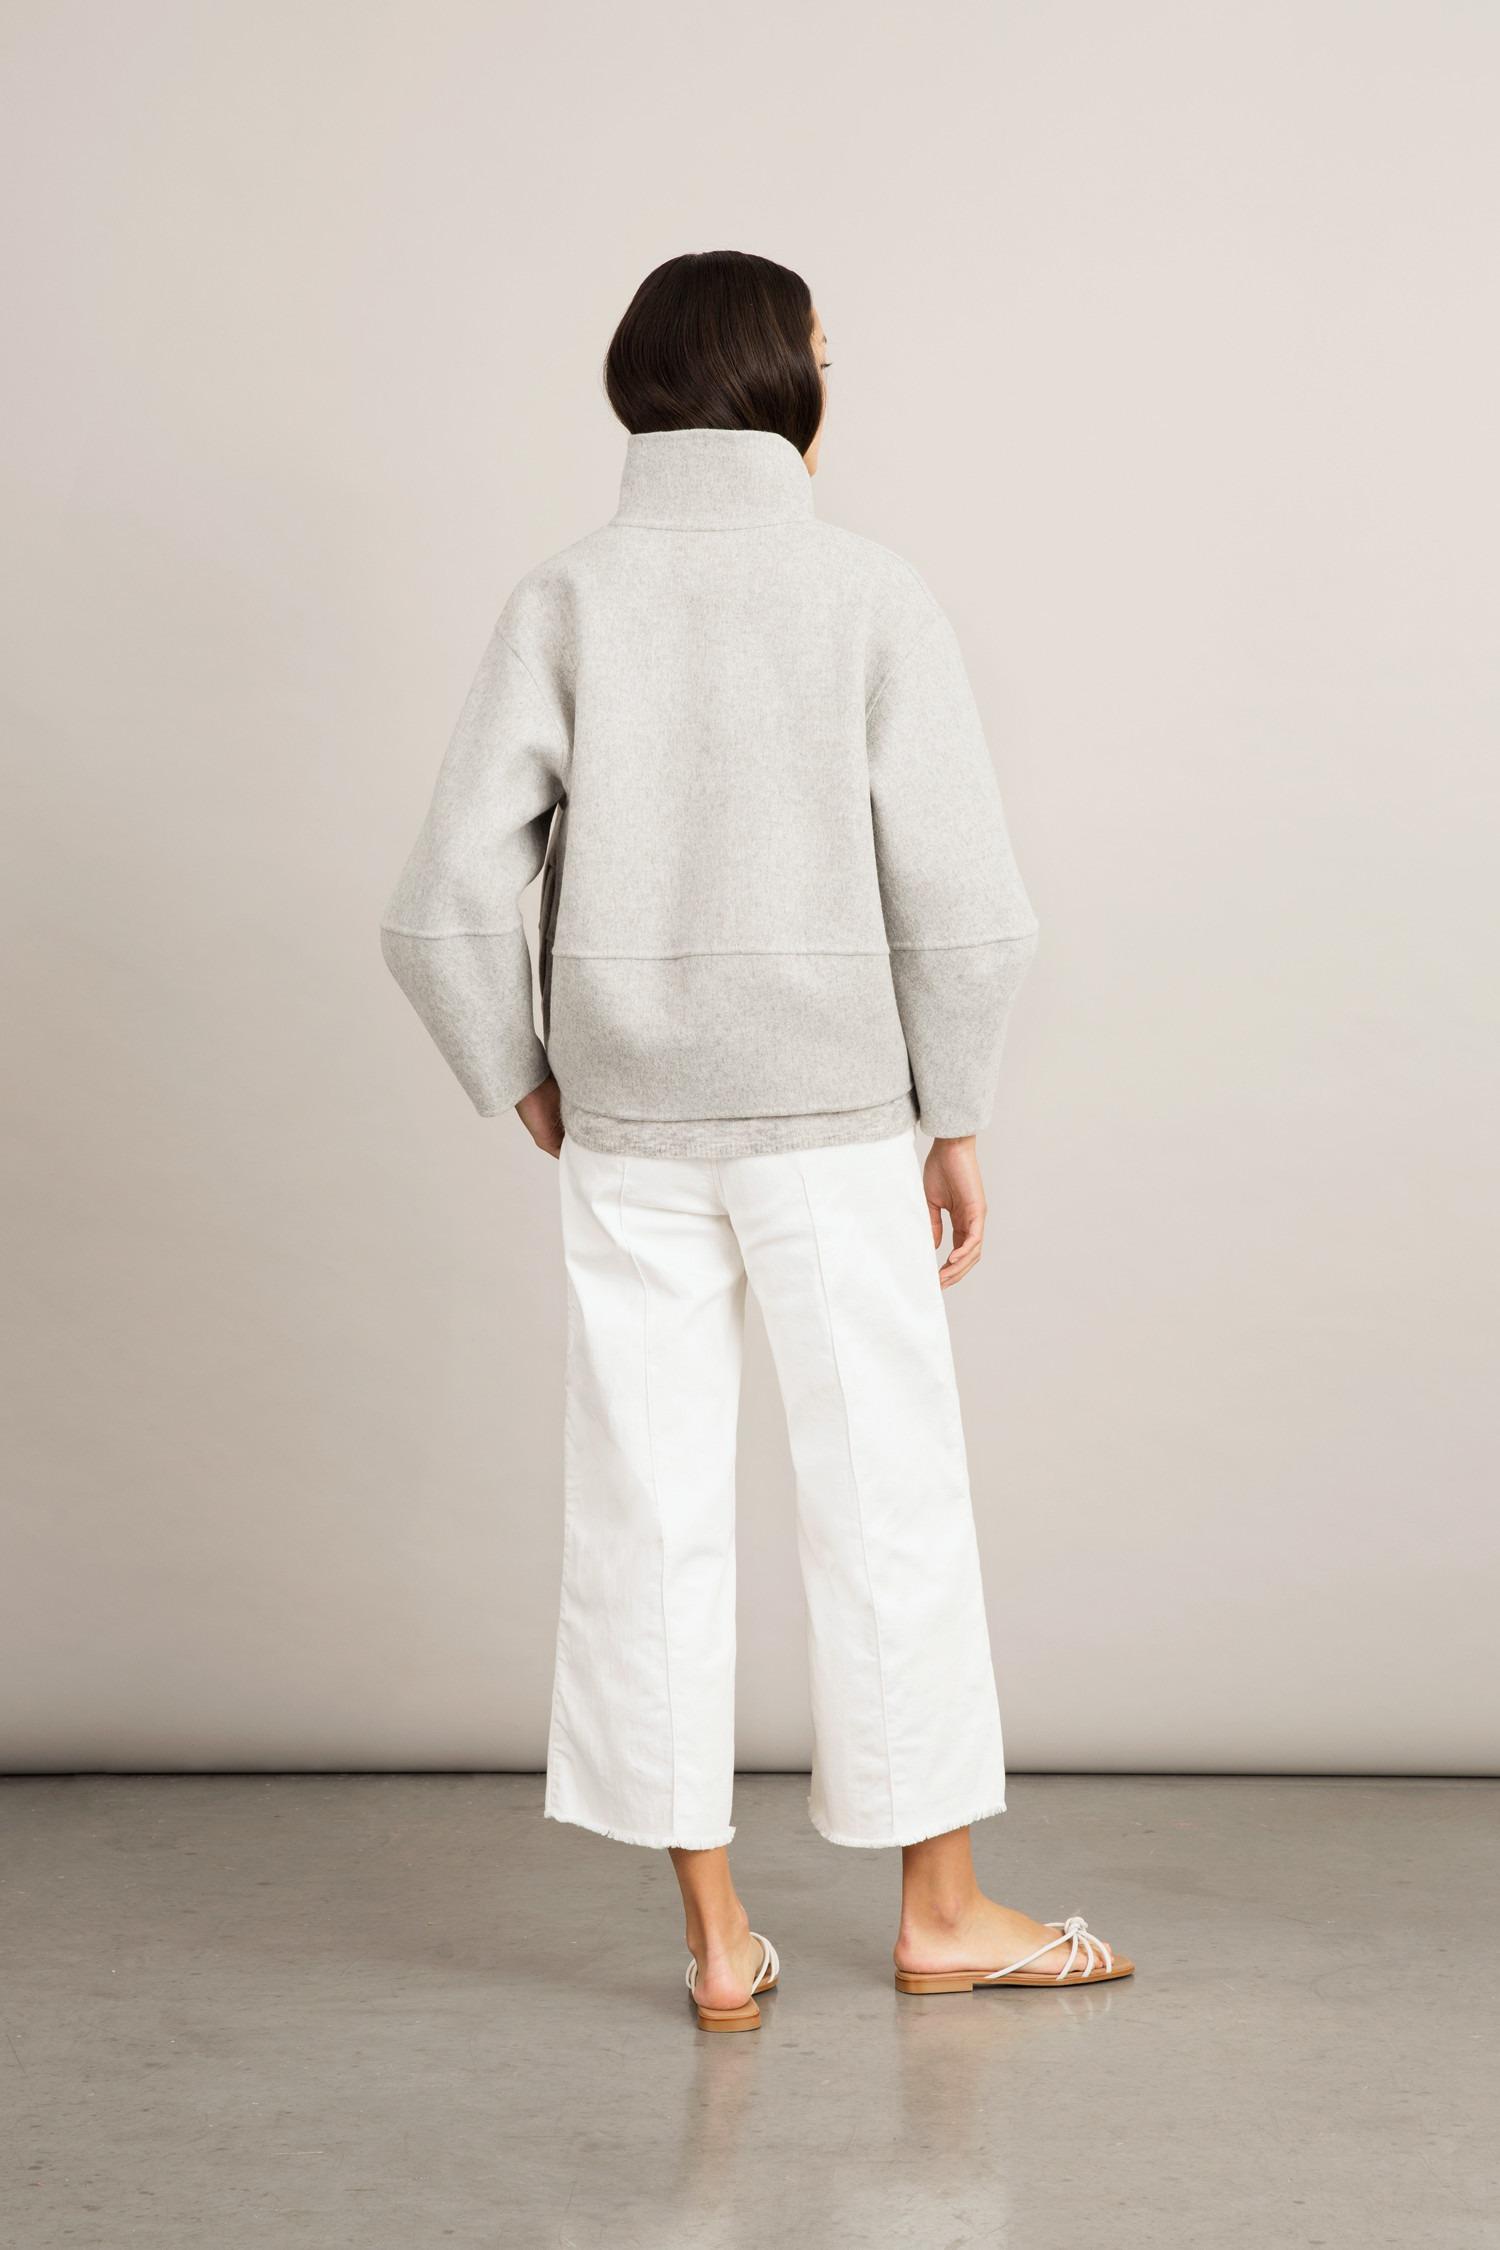 Stylein - Taormina Jacket - Back